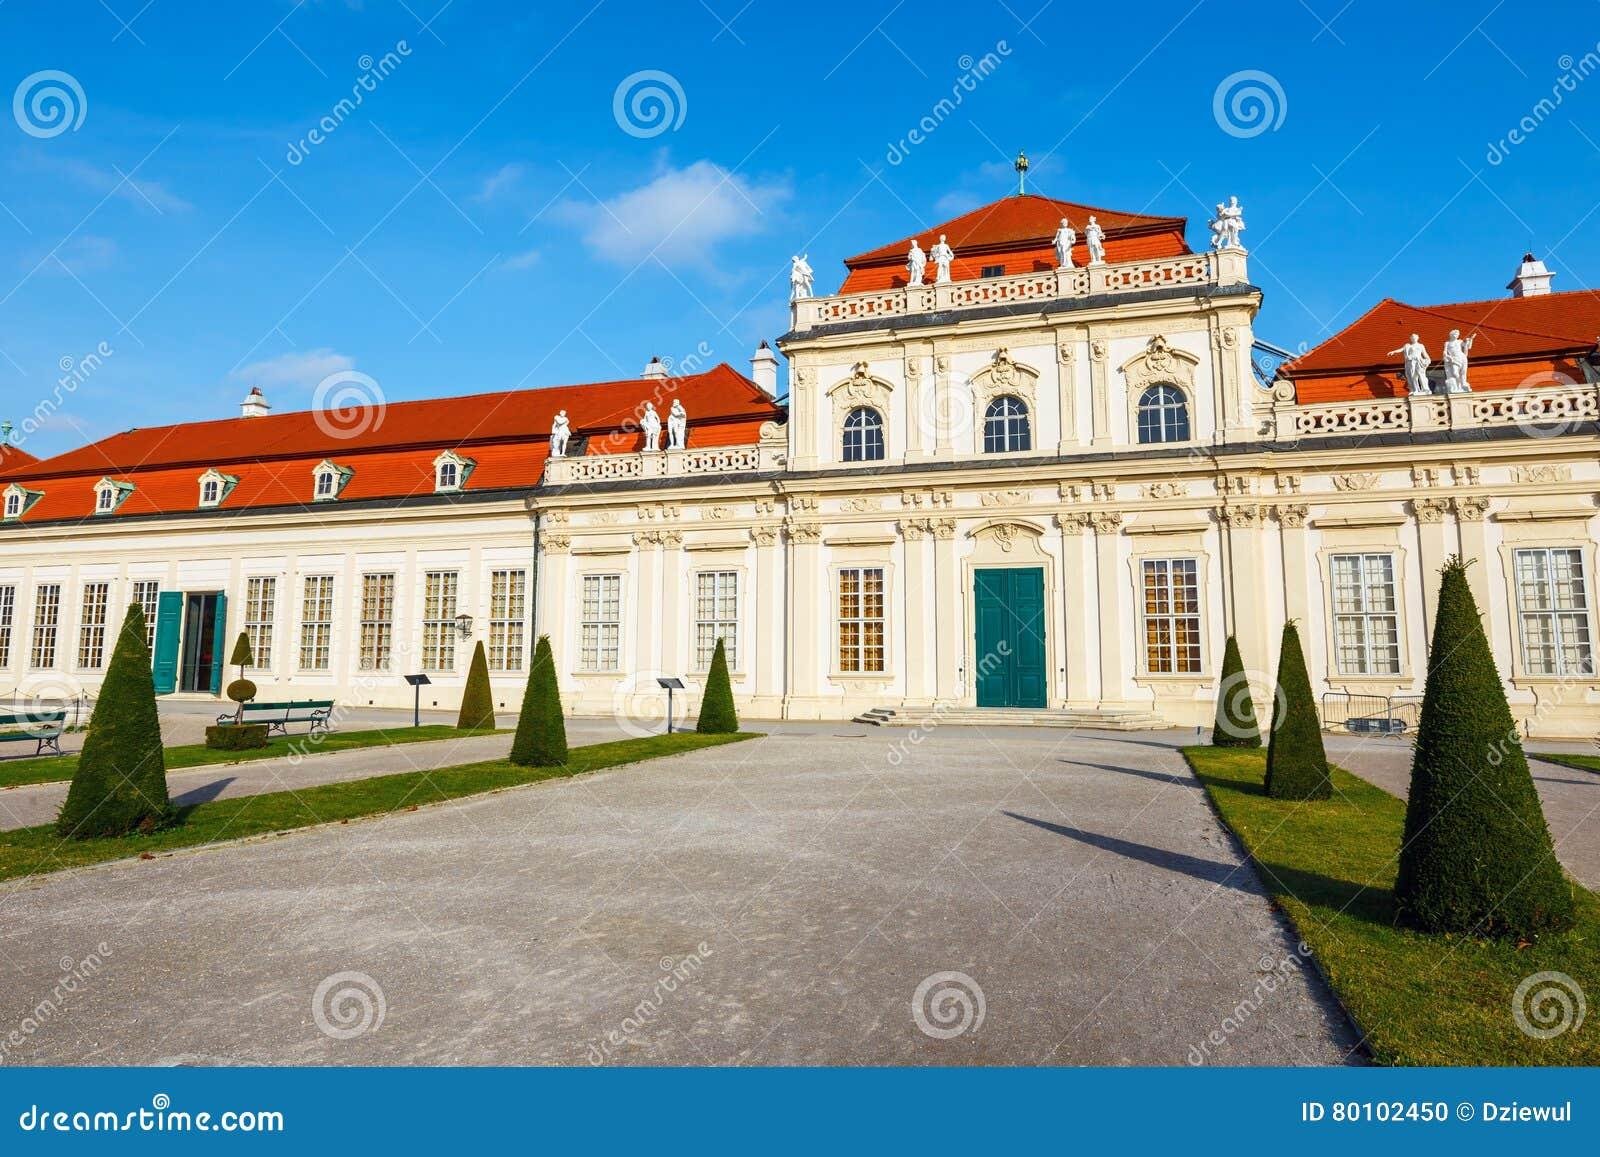 Дворец и сад бельведера в вене